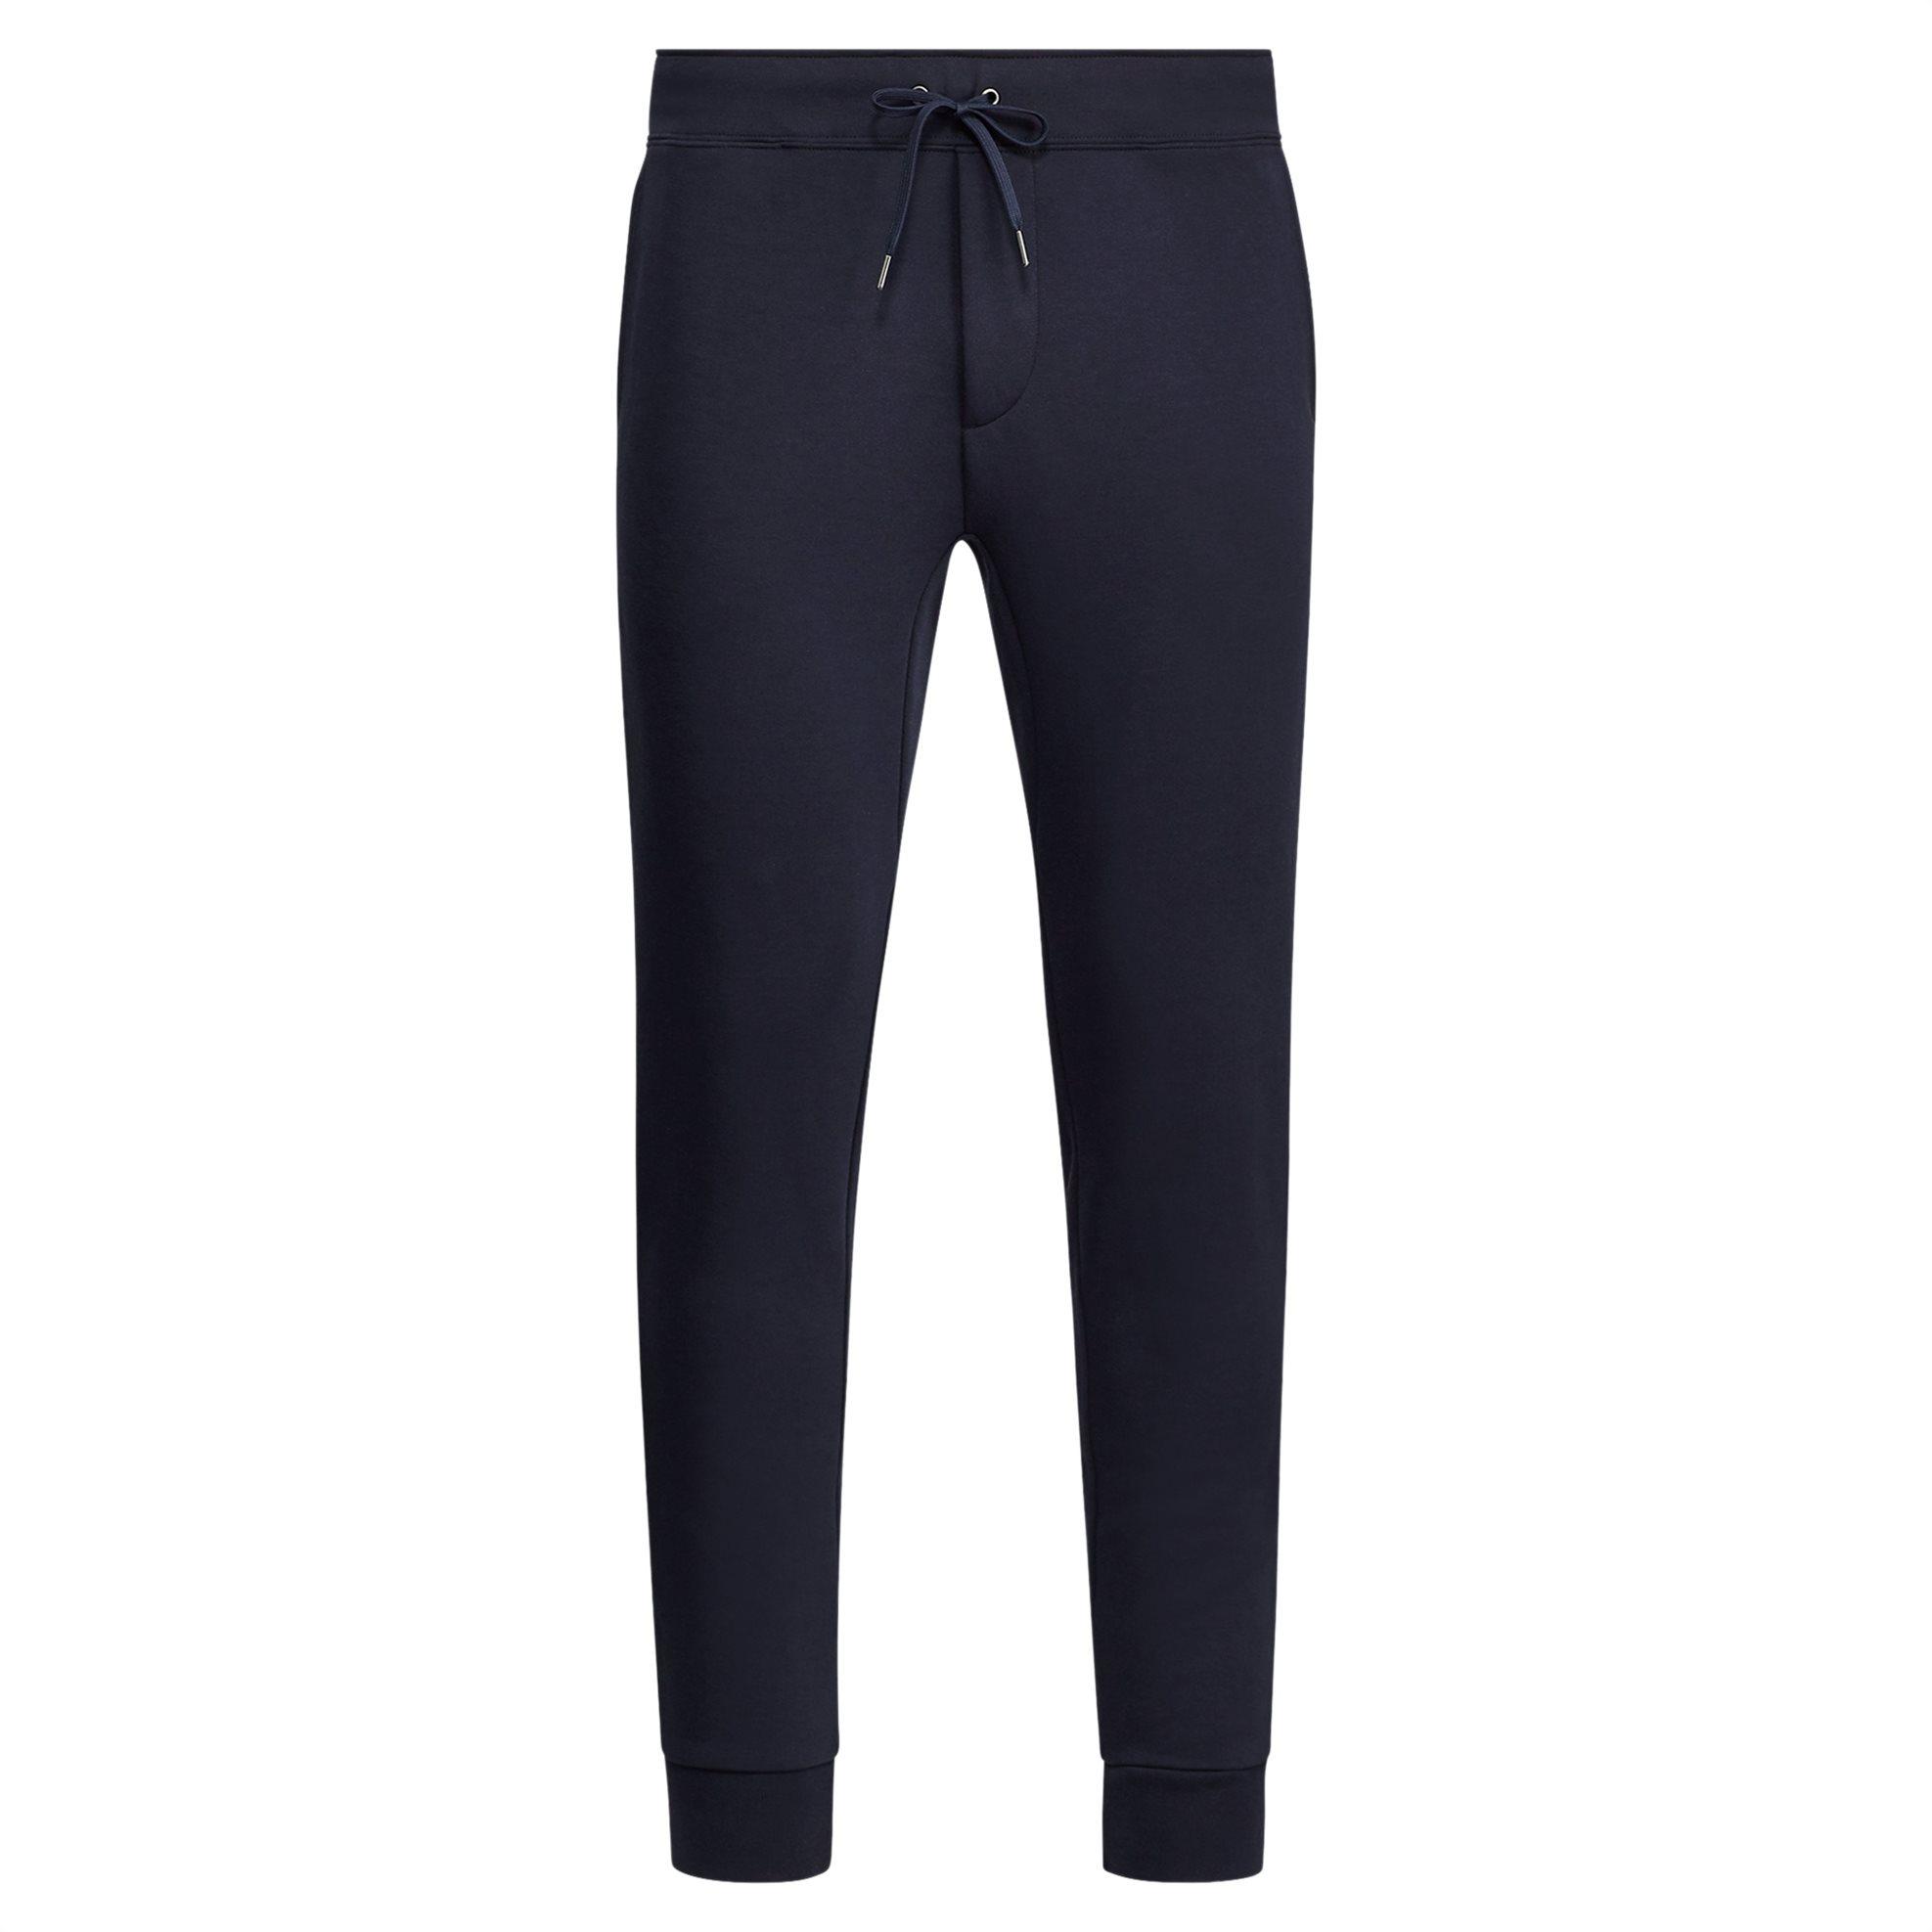 Polo Ralph Lauren ανδρικό μπλε σκούρο παντελόνι φόρμας Double-Knit Jogger - 7106 ανδρασ   ρουχα   παντελόνια   φόρμες